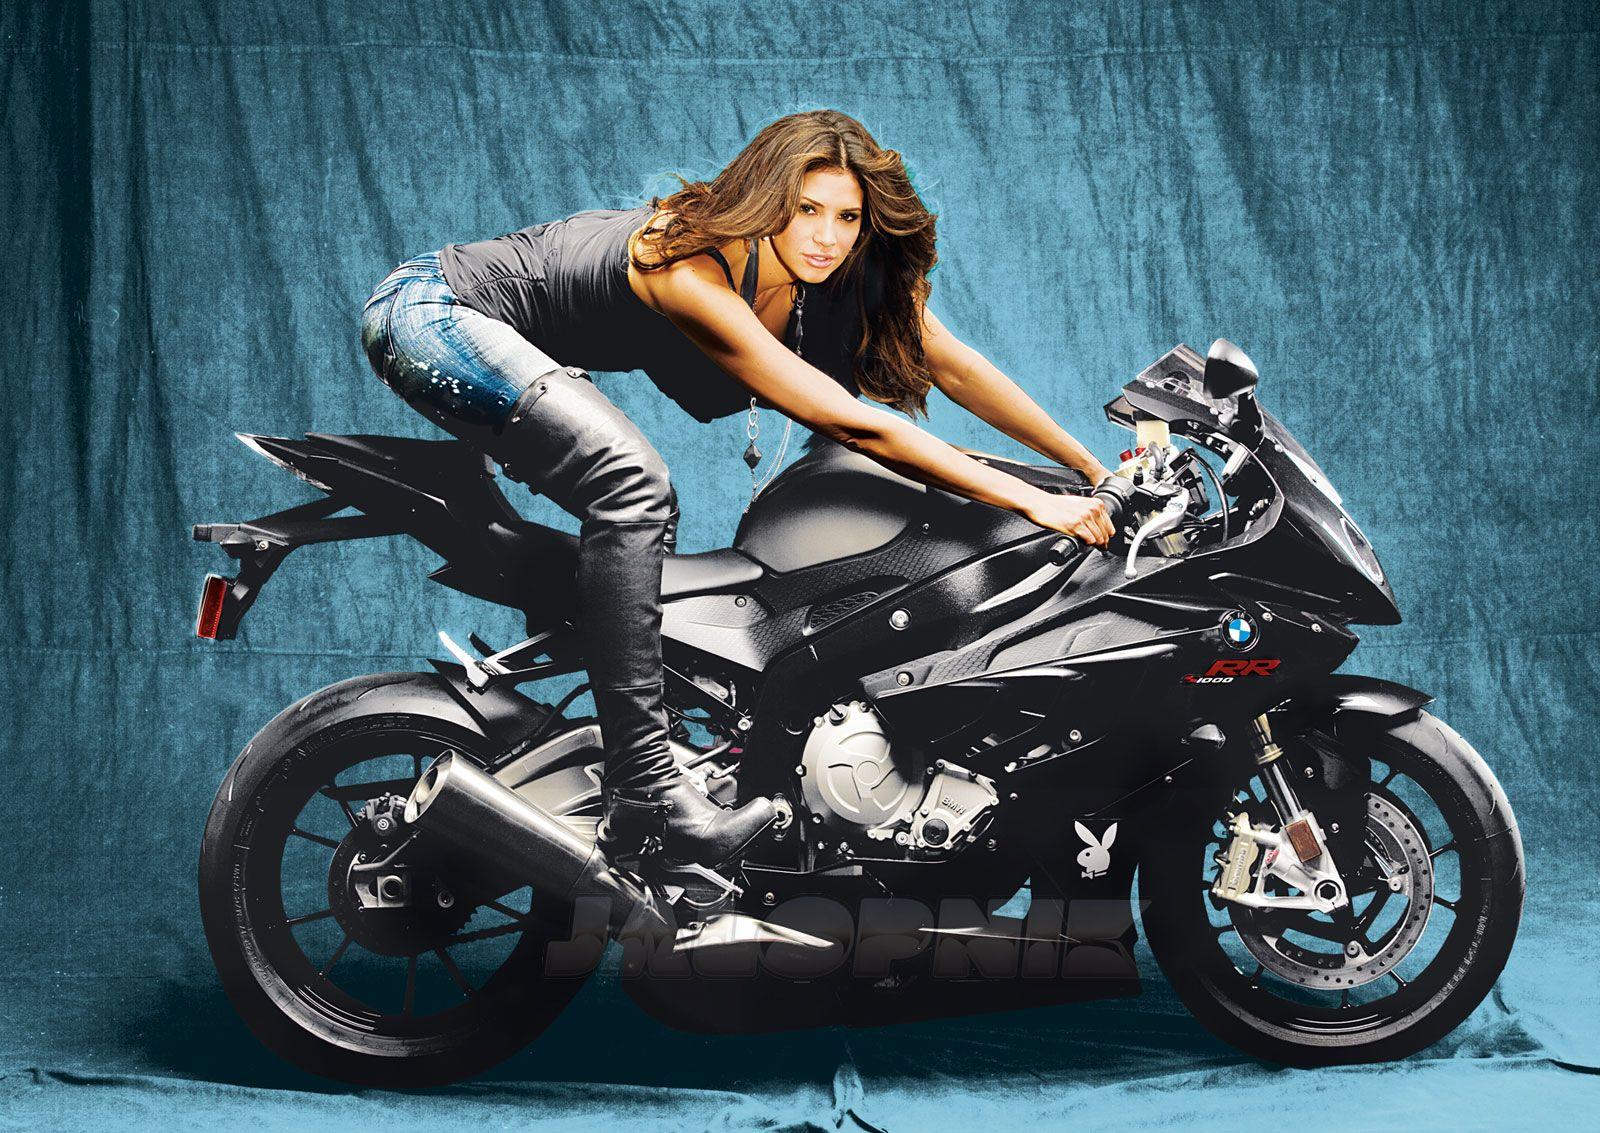 Pin On Motorcycle Car